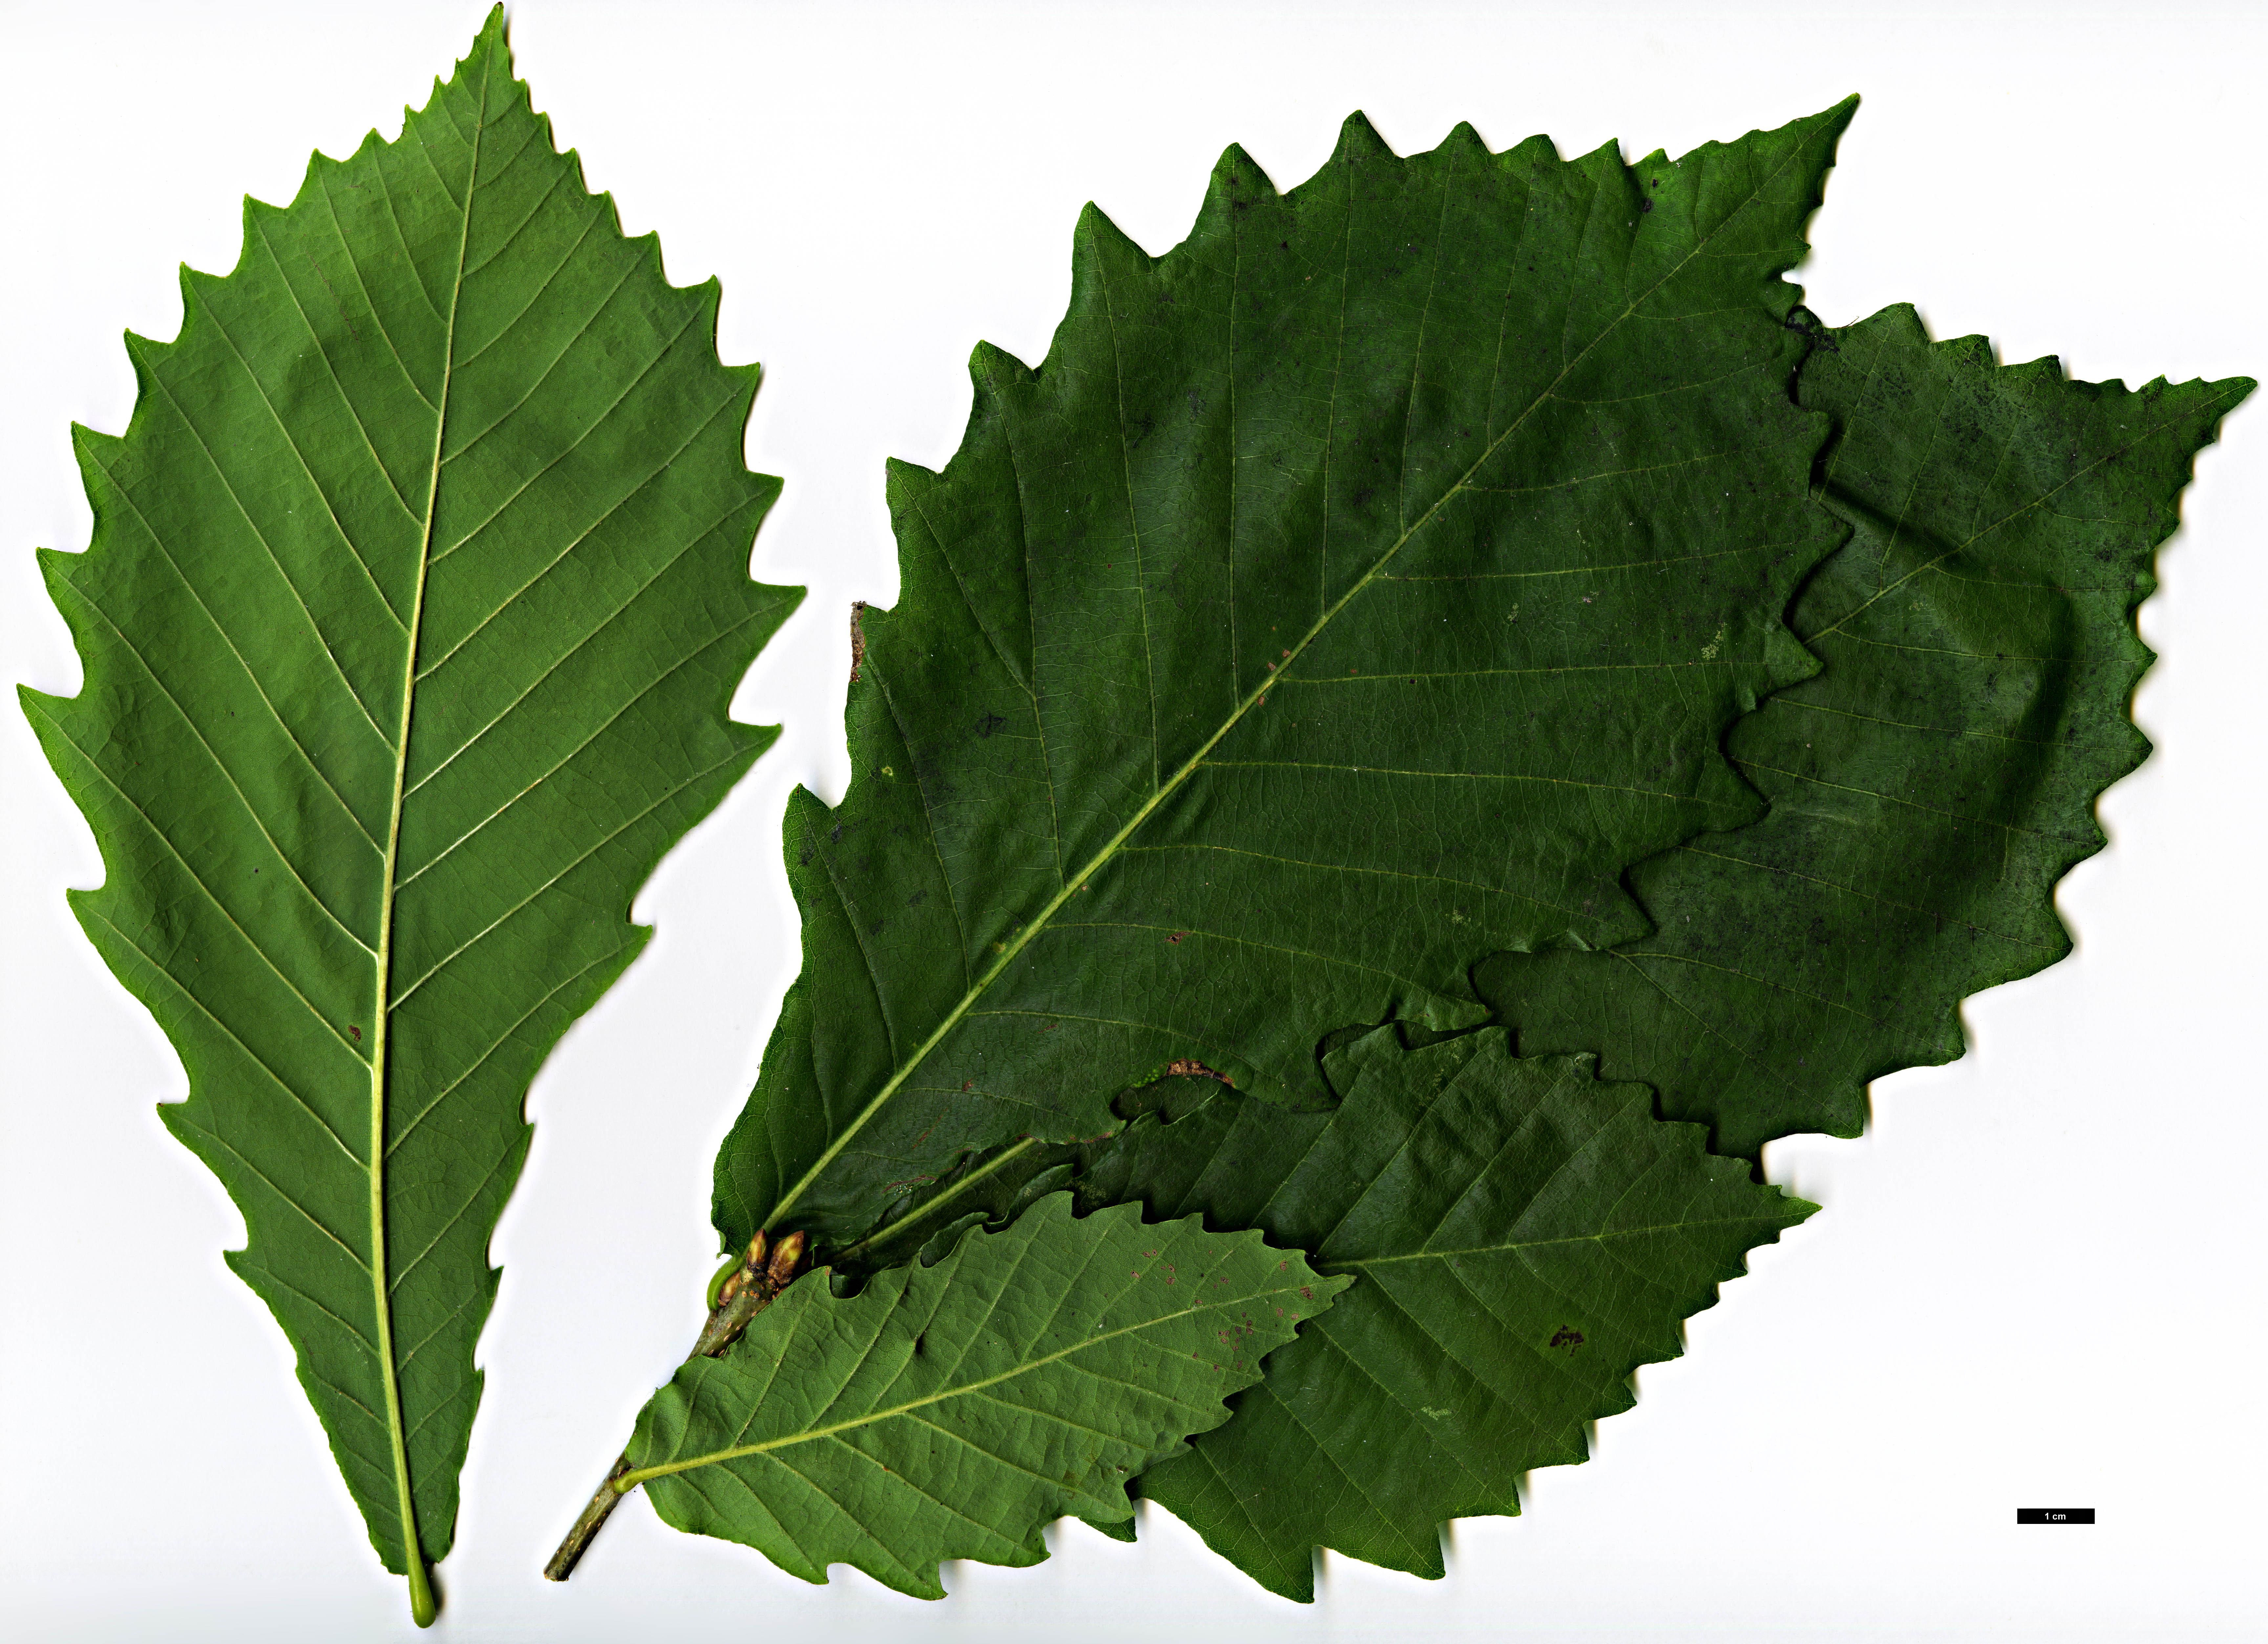 http://www.oaknames.org/images/leafpics/Quercus_crispula_HGAA19890384A-Warner-Howick-JP_JDL016977_30JUL2010_04.jpg